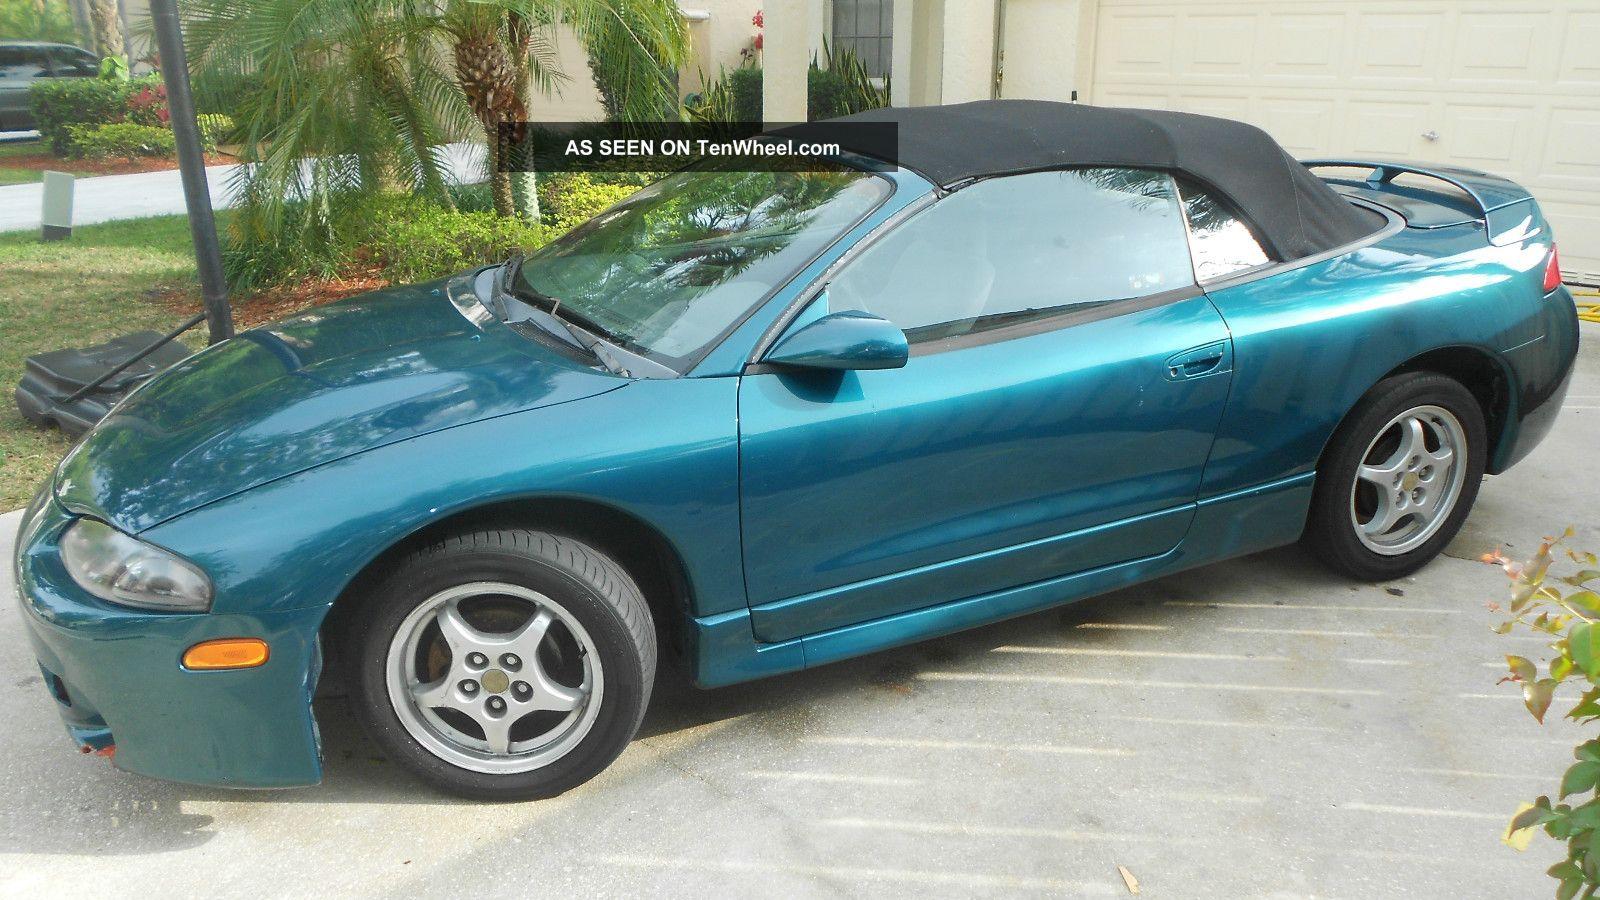 1997 mitsubishi eclipse spyder gs convertible 2 door 2 4l convertible top. Black Bedroom Furniture Sets. Home Design Ideas